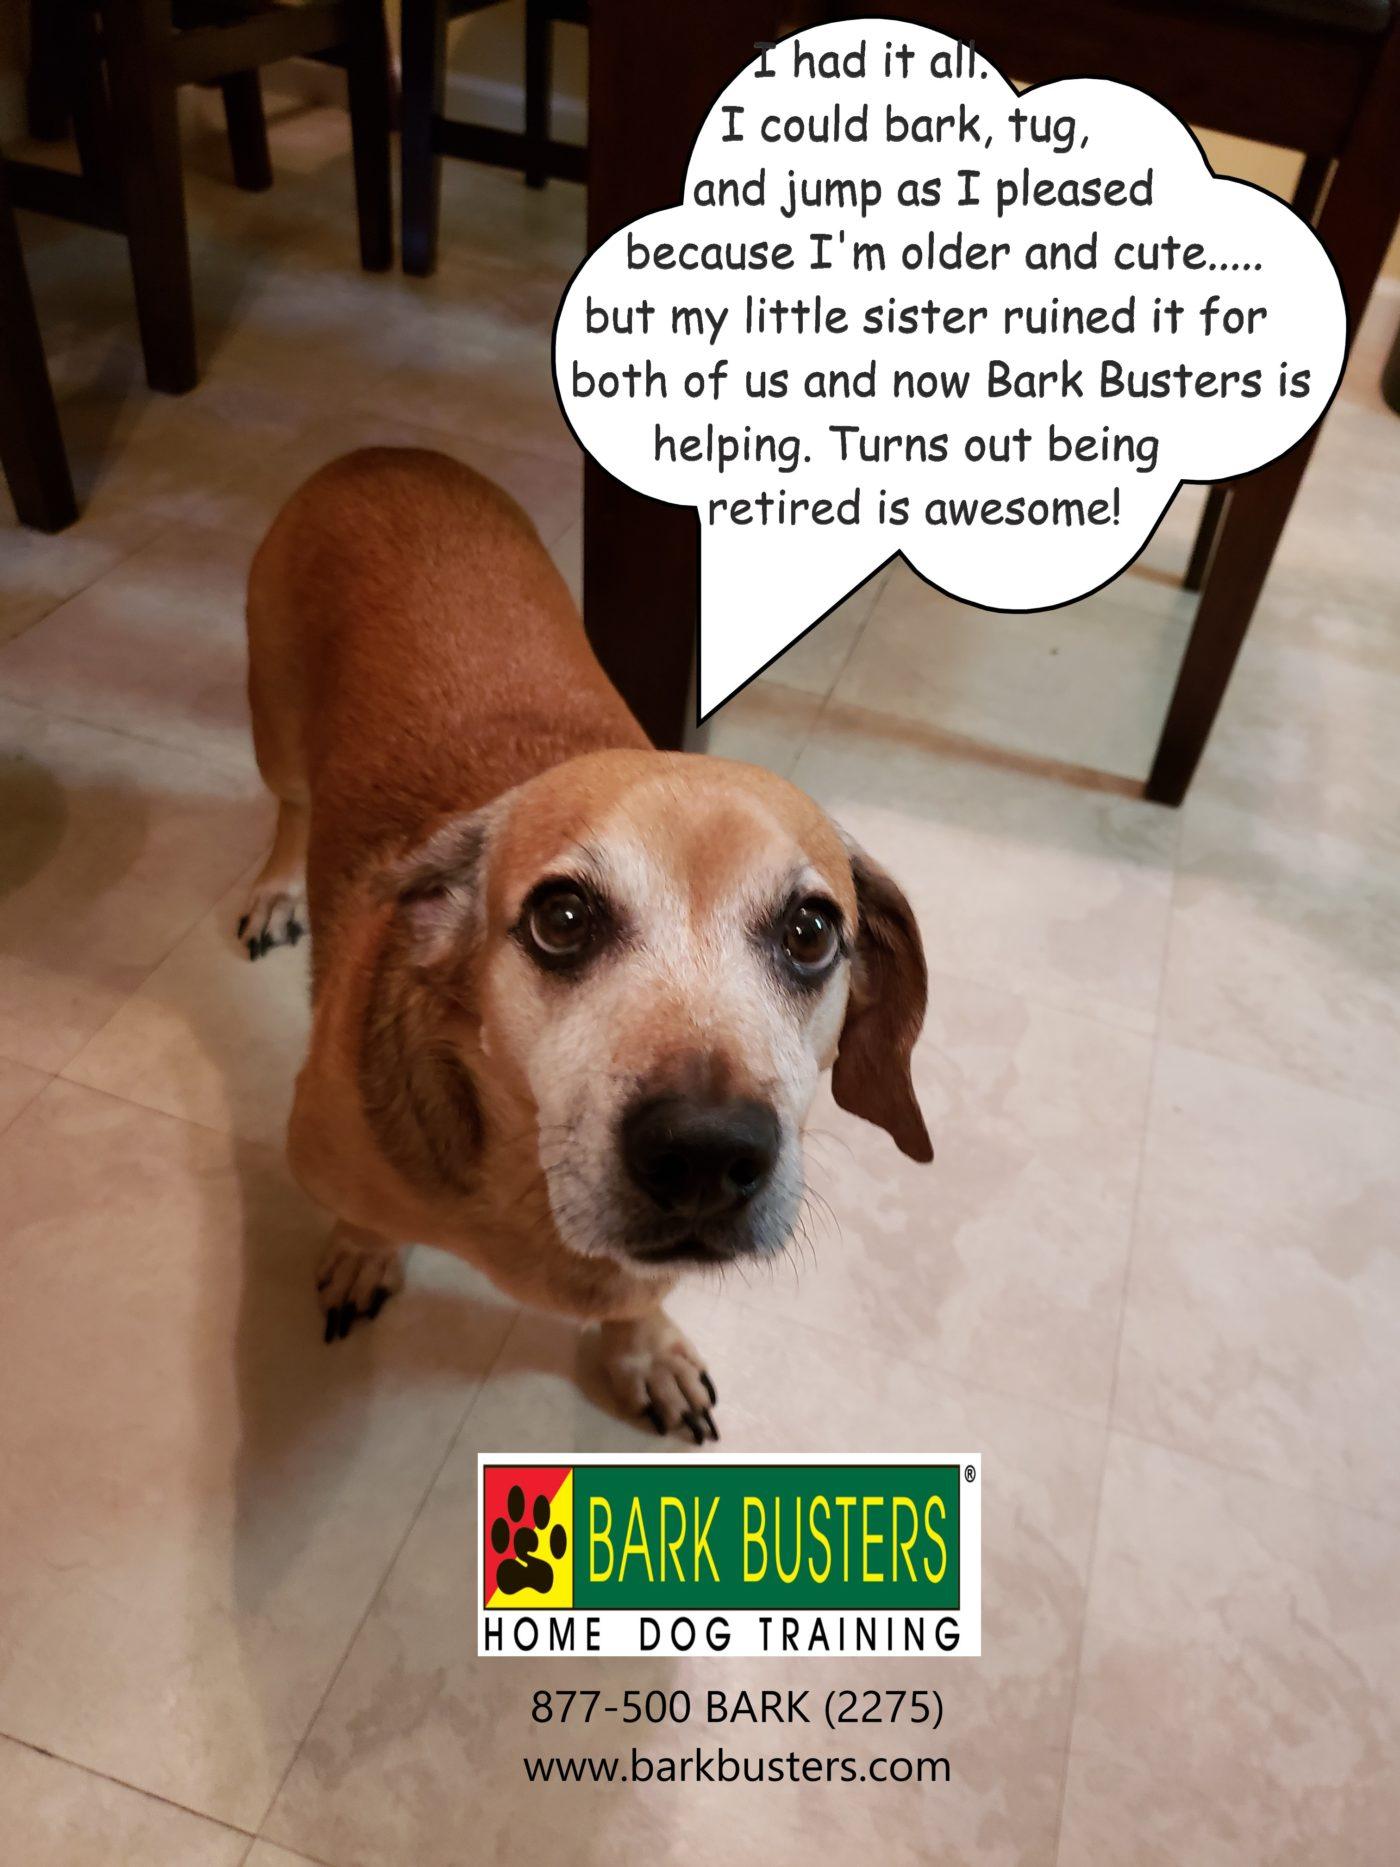 #dachshunddogtraining #dogsofbarkbusters #bestdogtrainingeastaustin #dogtrainerroundrock